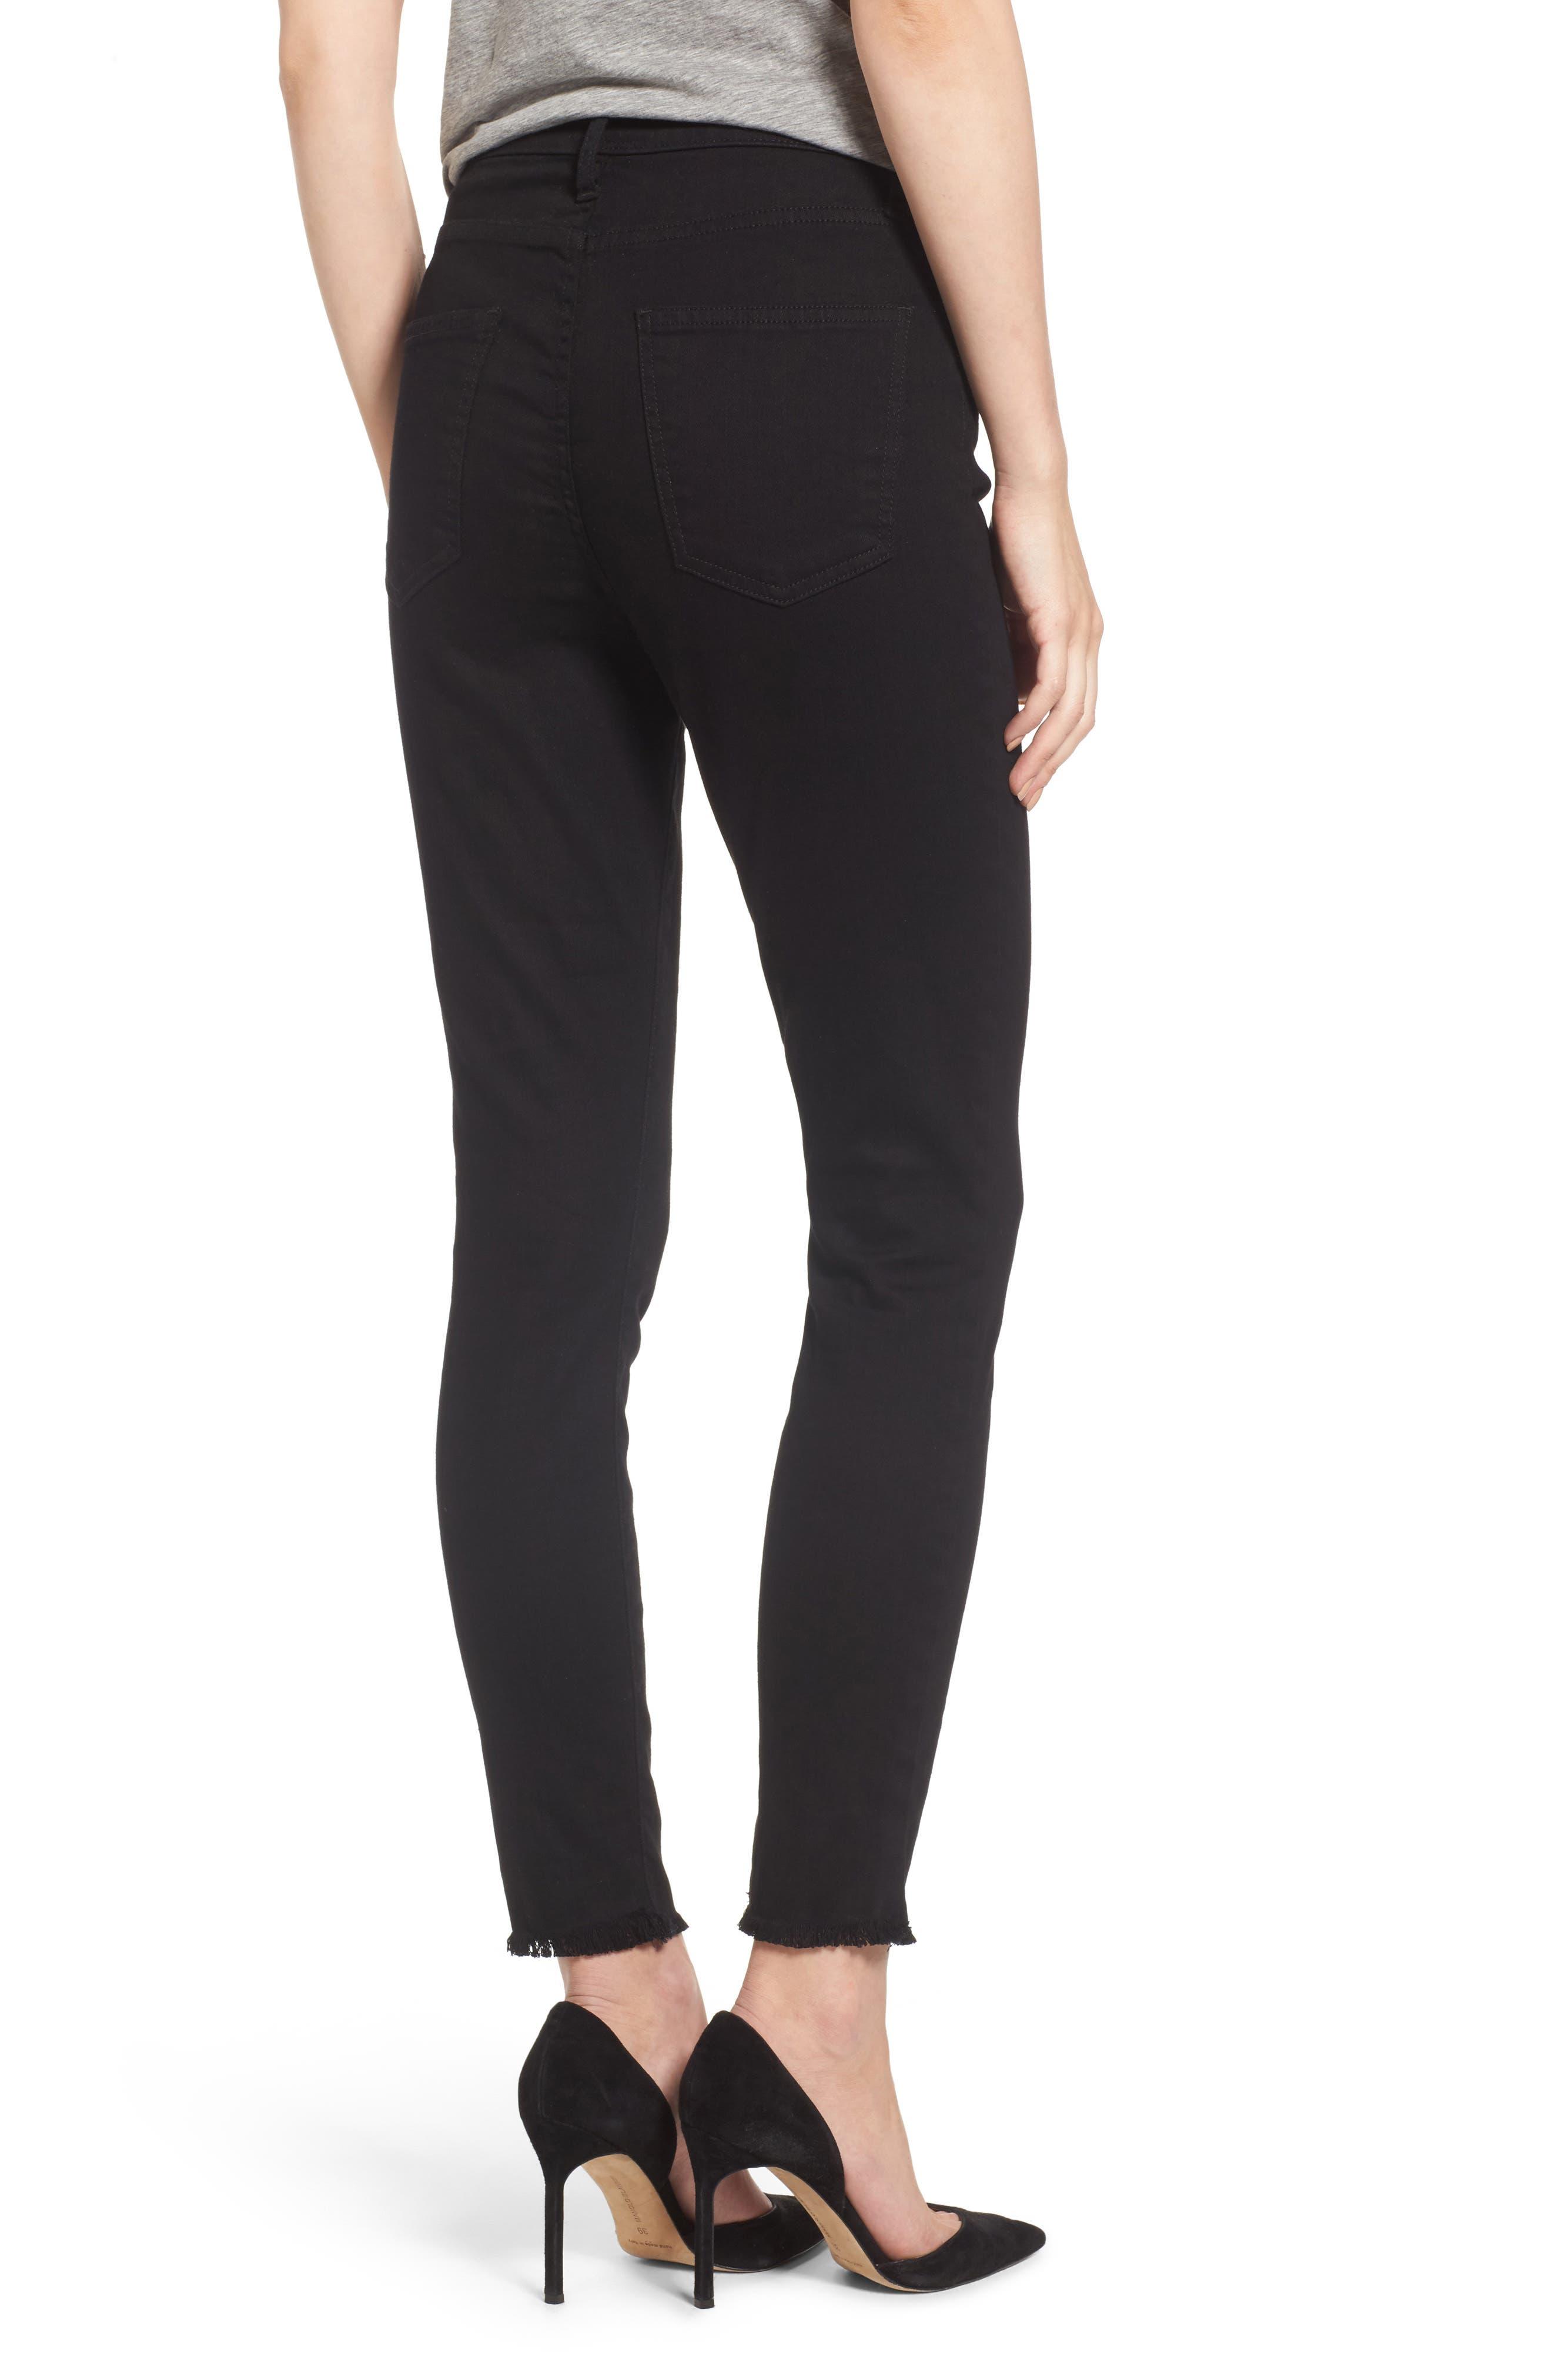 The Super High Waist Stiletto Ankle Skinny Jeans,                             Alternate thumbnail 2, color,                             005